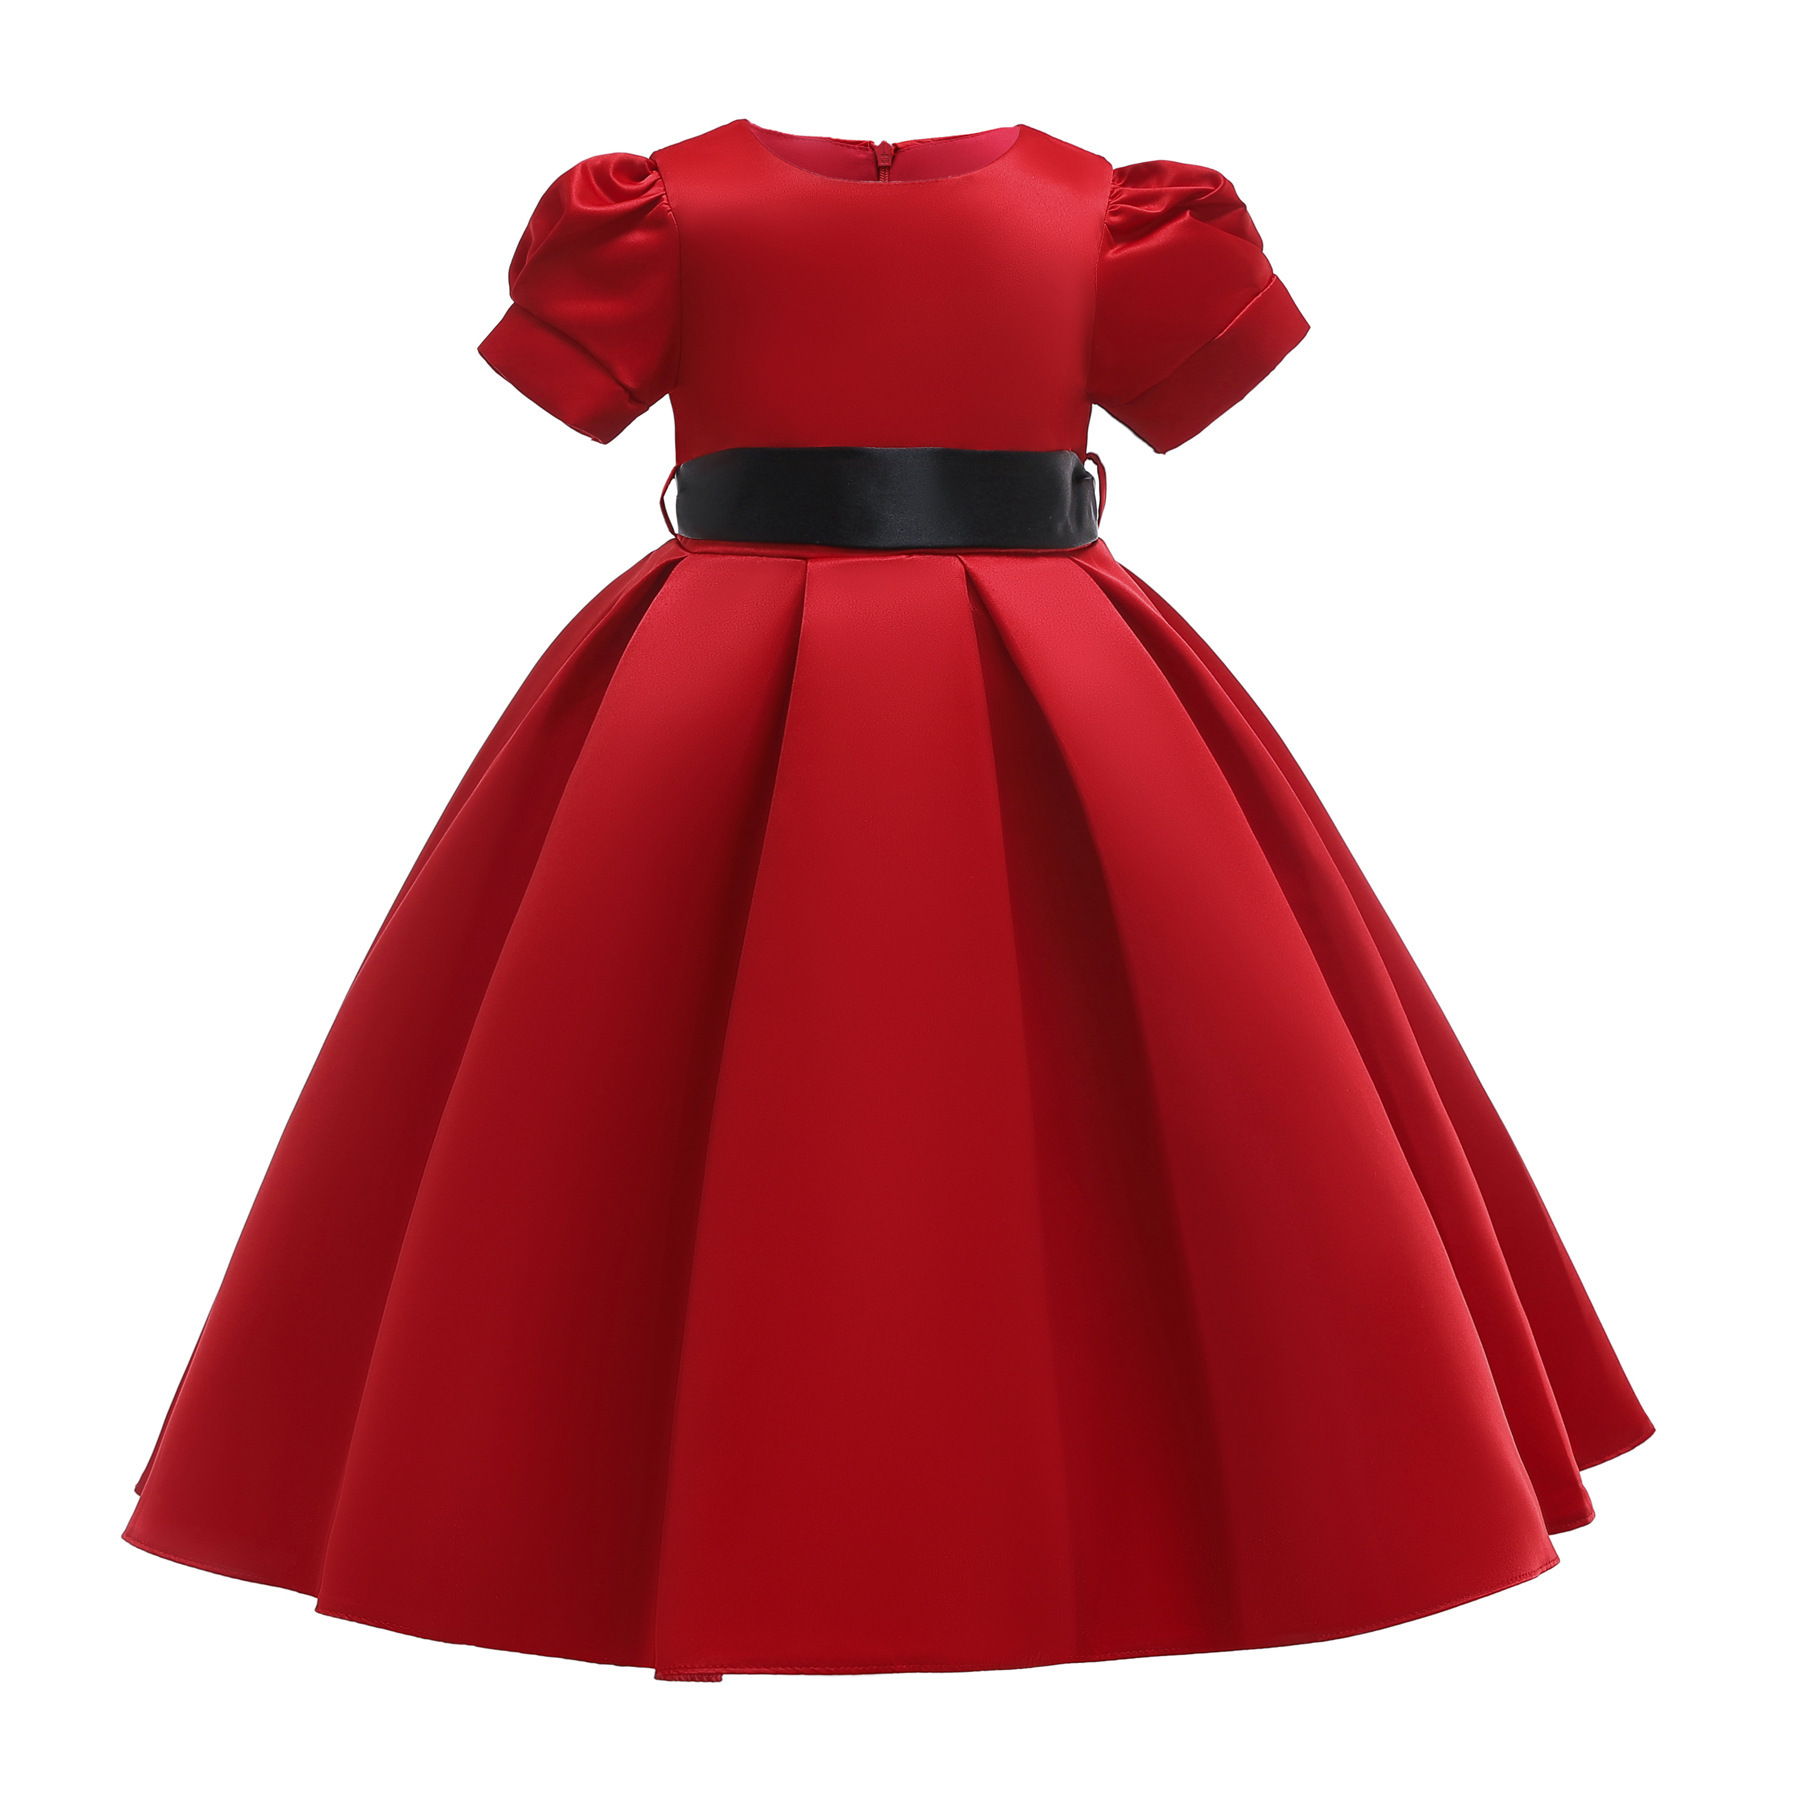 Girls Dress Sukienki Short Sleeve Solid Color Evening Dresses Kids Deguisement Enfant Fille Free Shipping in Dresses from Mother Kids